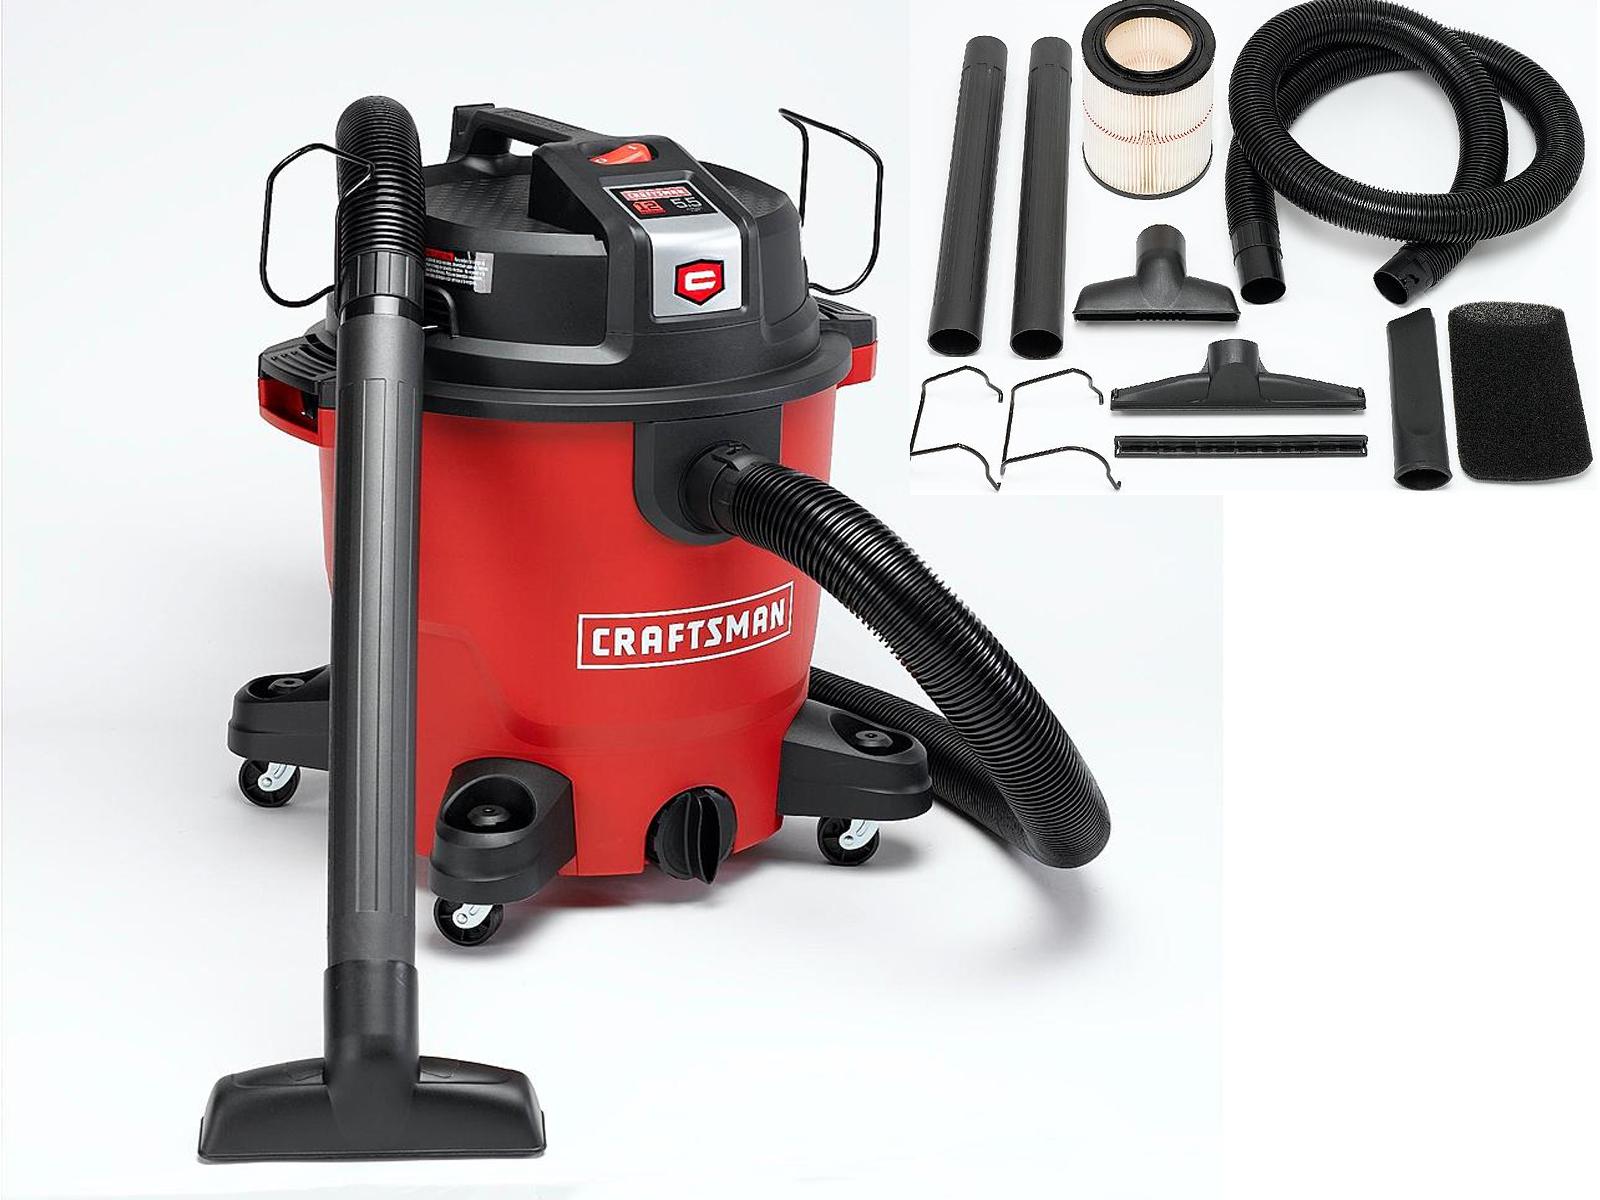 Craftsman XSP 12-Gallon 5.5 HP Wet/Dry Vac Set